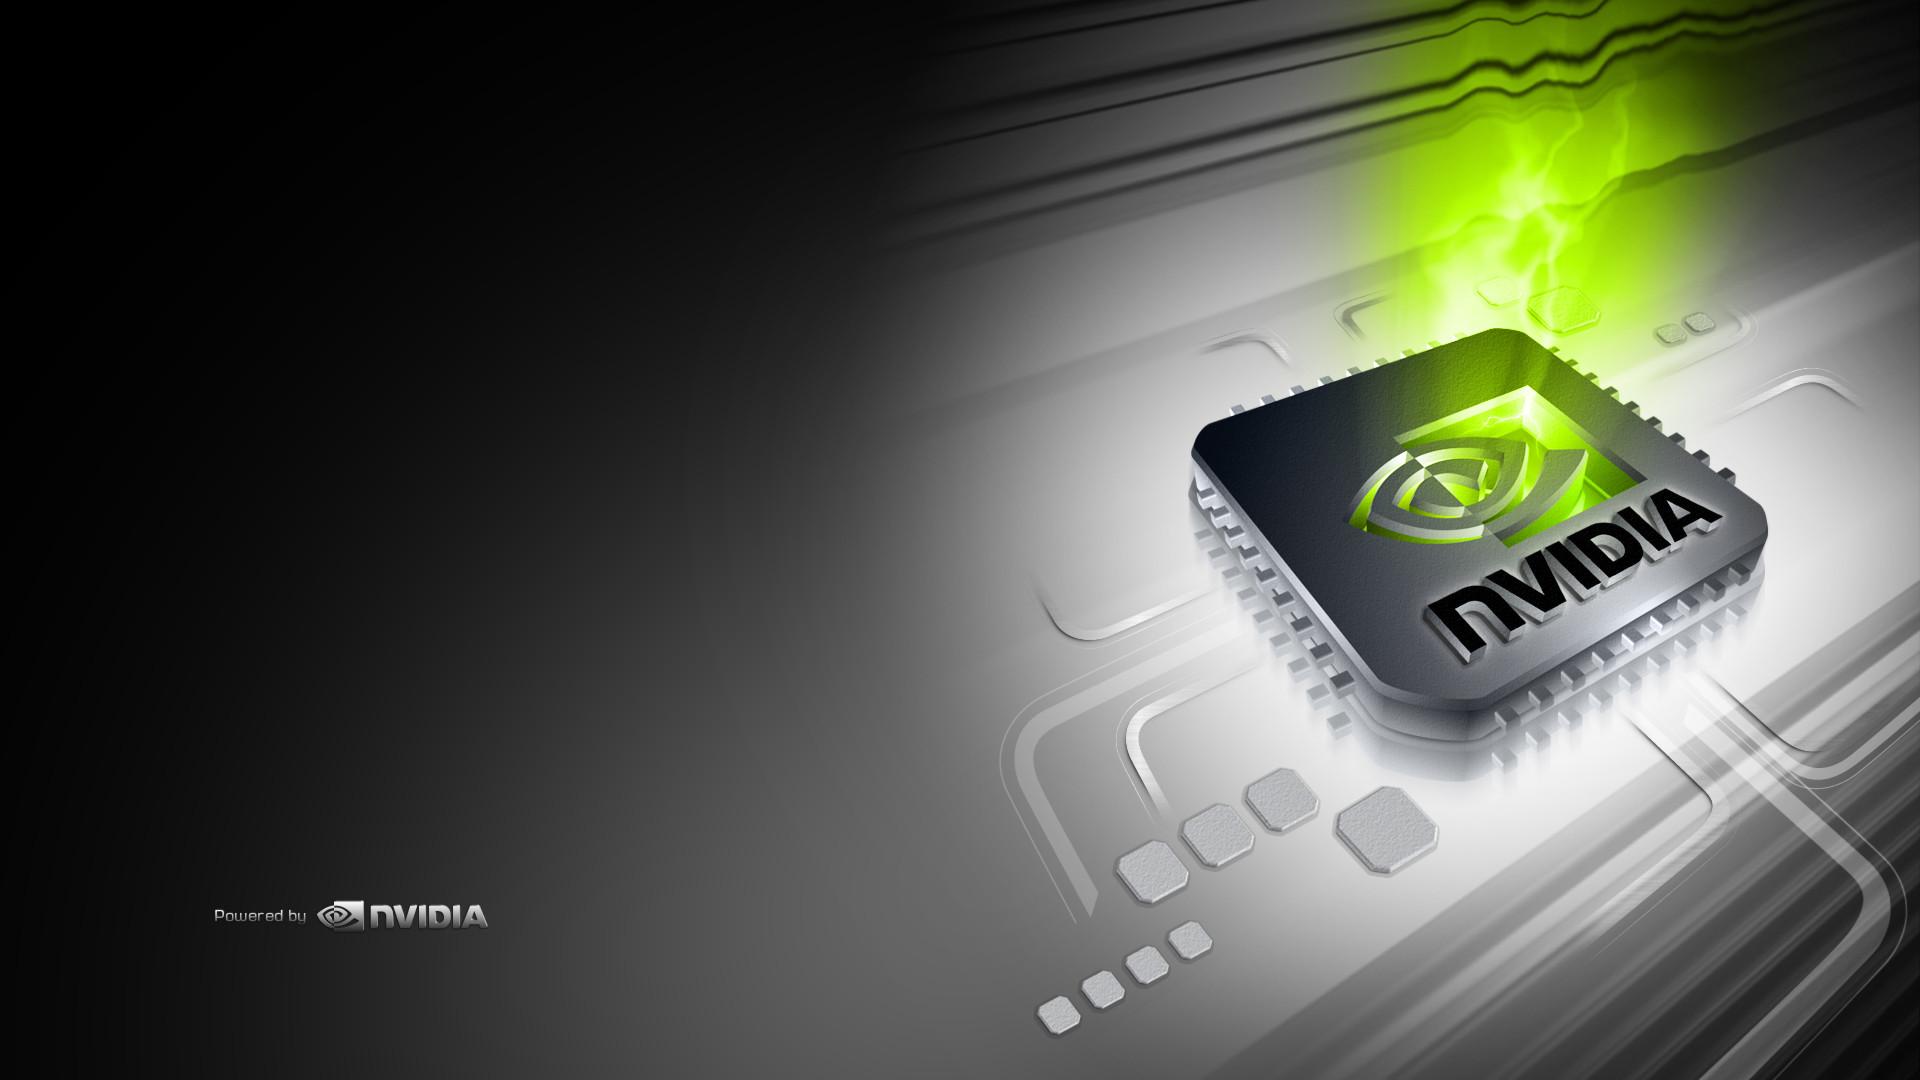 Nvidia-HD-Wallpaper.jpg